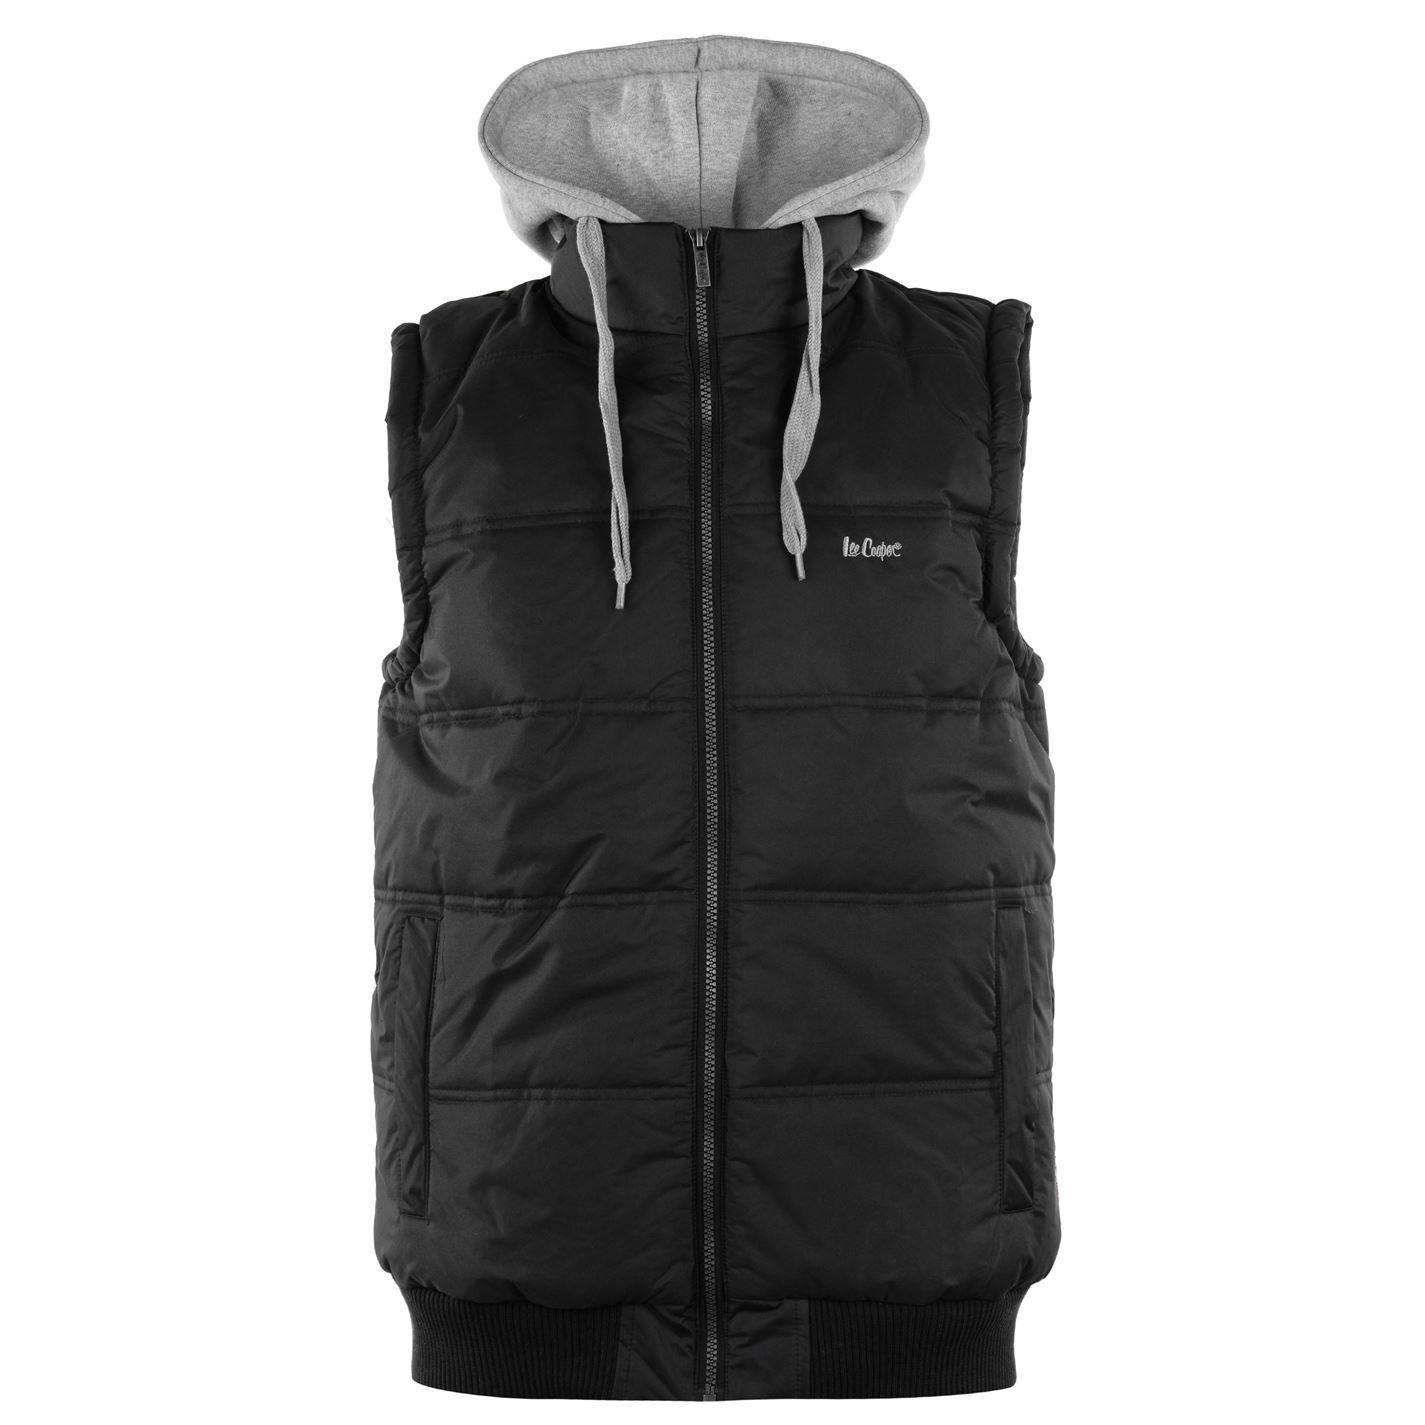 7cf52af440 Lee Cooper Mens Hooded Gilet Sleeveless Jacket Zip Full Winter Warm  Drawstring